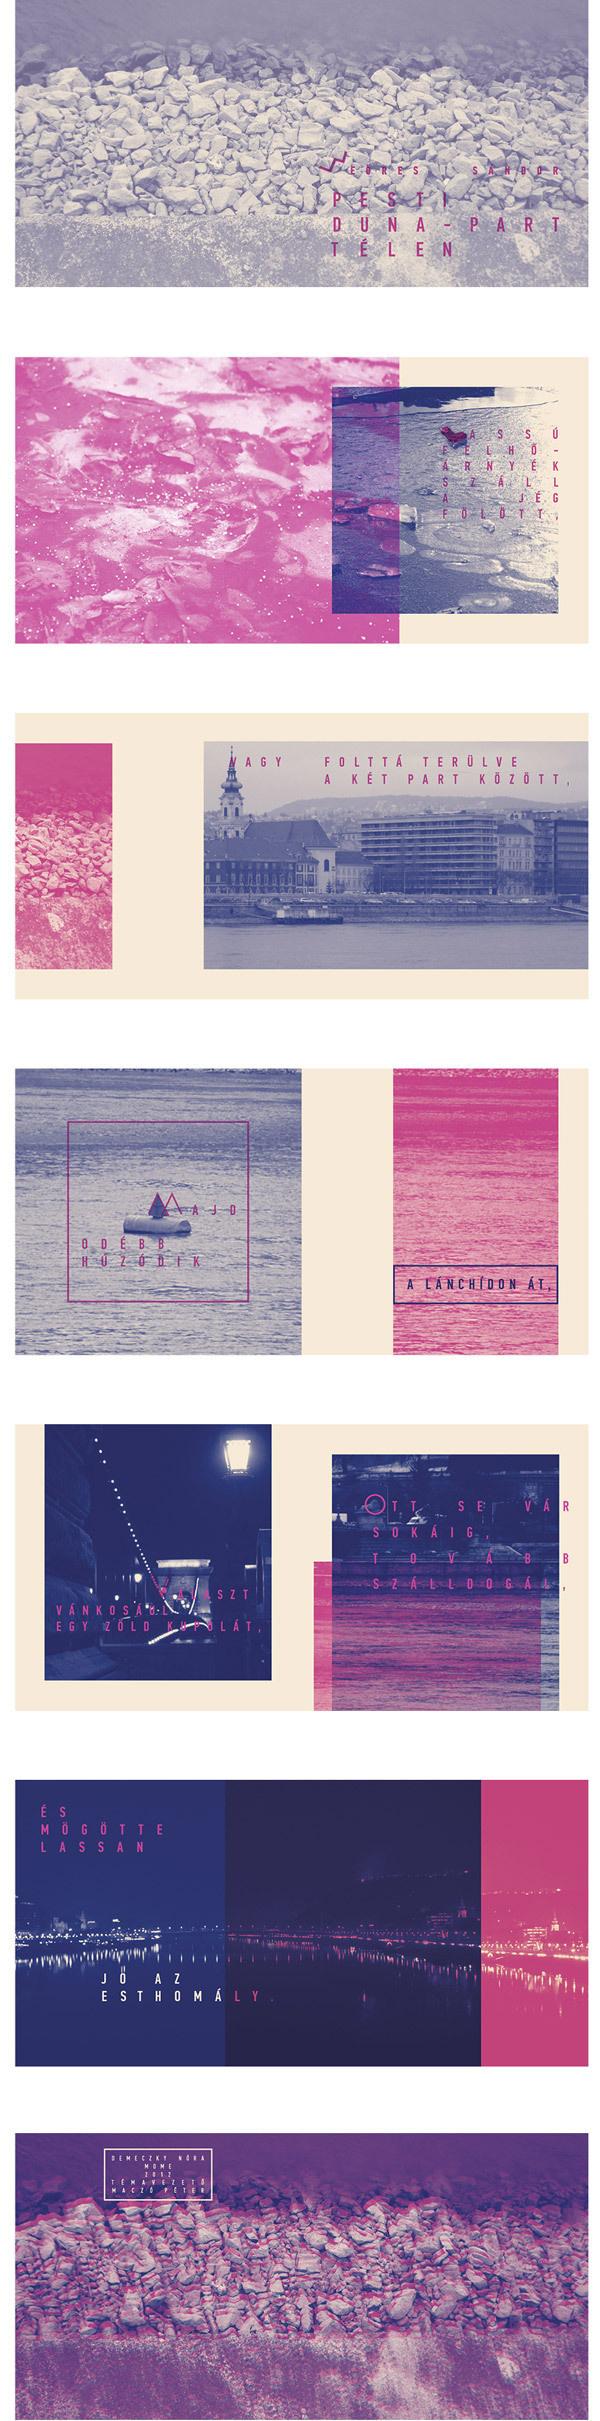 WEÖRES 100 on Behance #photo #layout #duotone